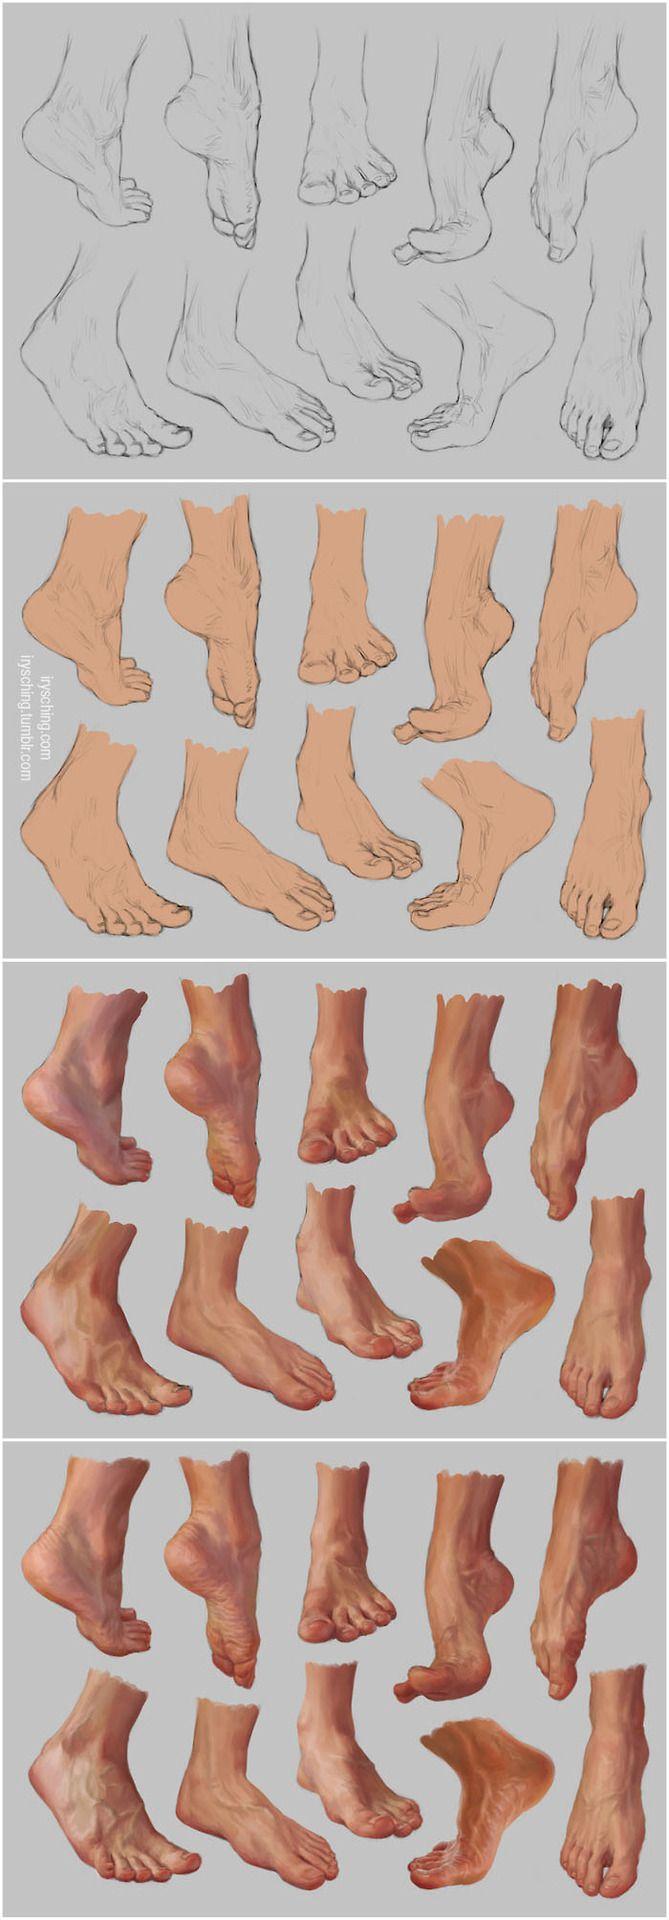 fucktonofanatomyreferences: fucktonofanatomyreferences: An orgasmic fuck-ton of human feet references. Sourced by gatorsaurus and ...